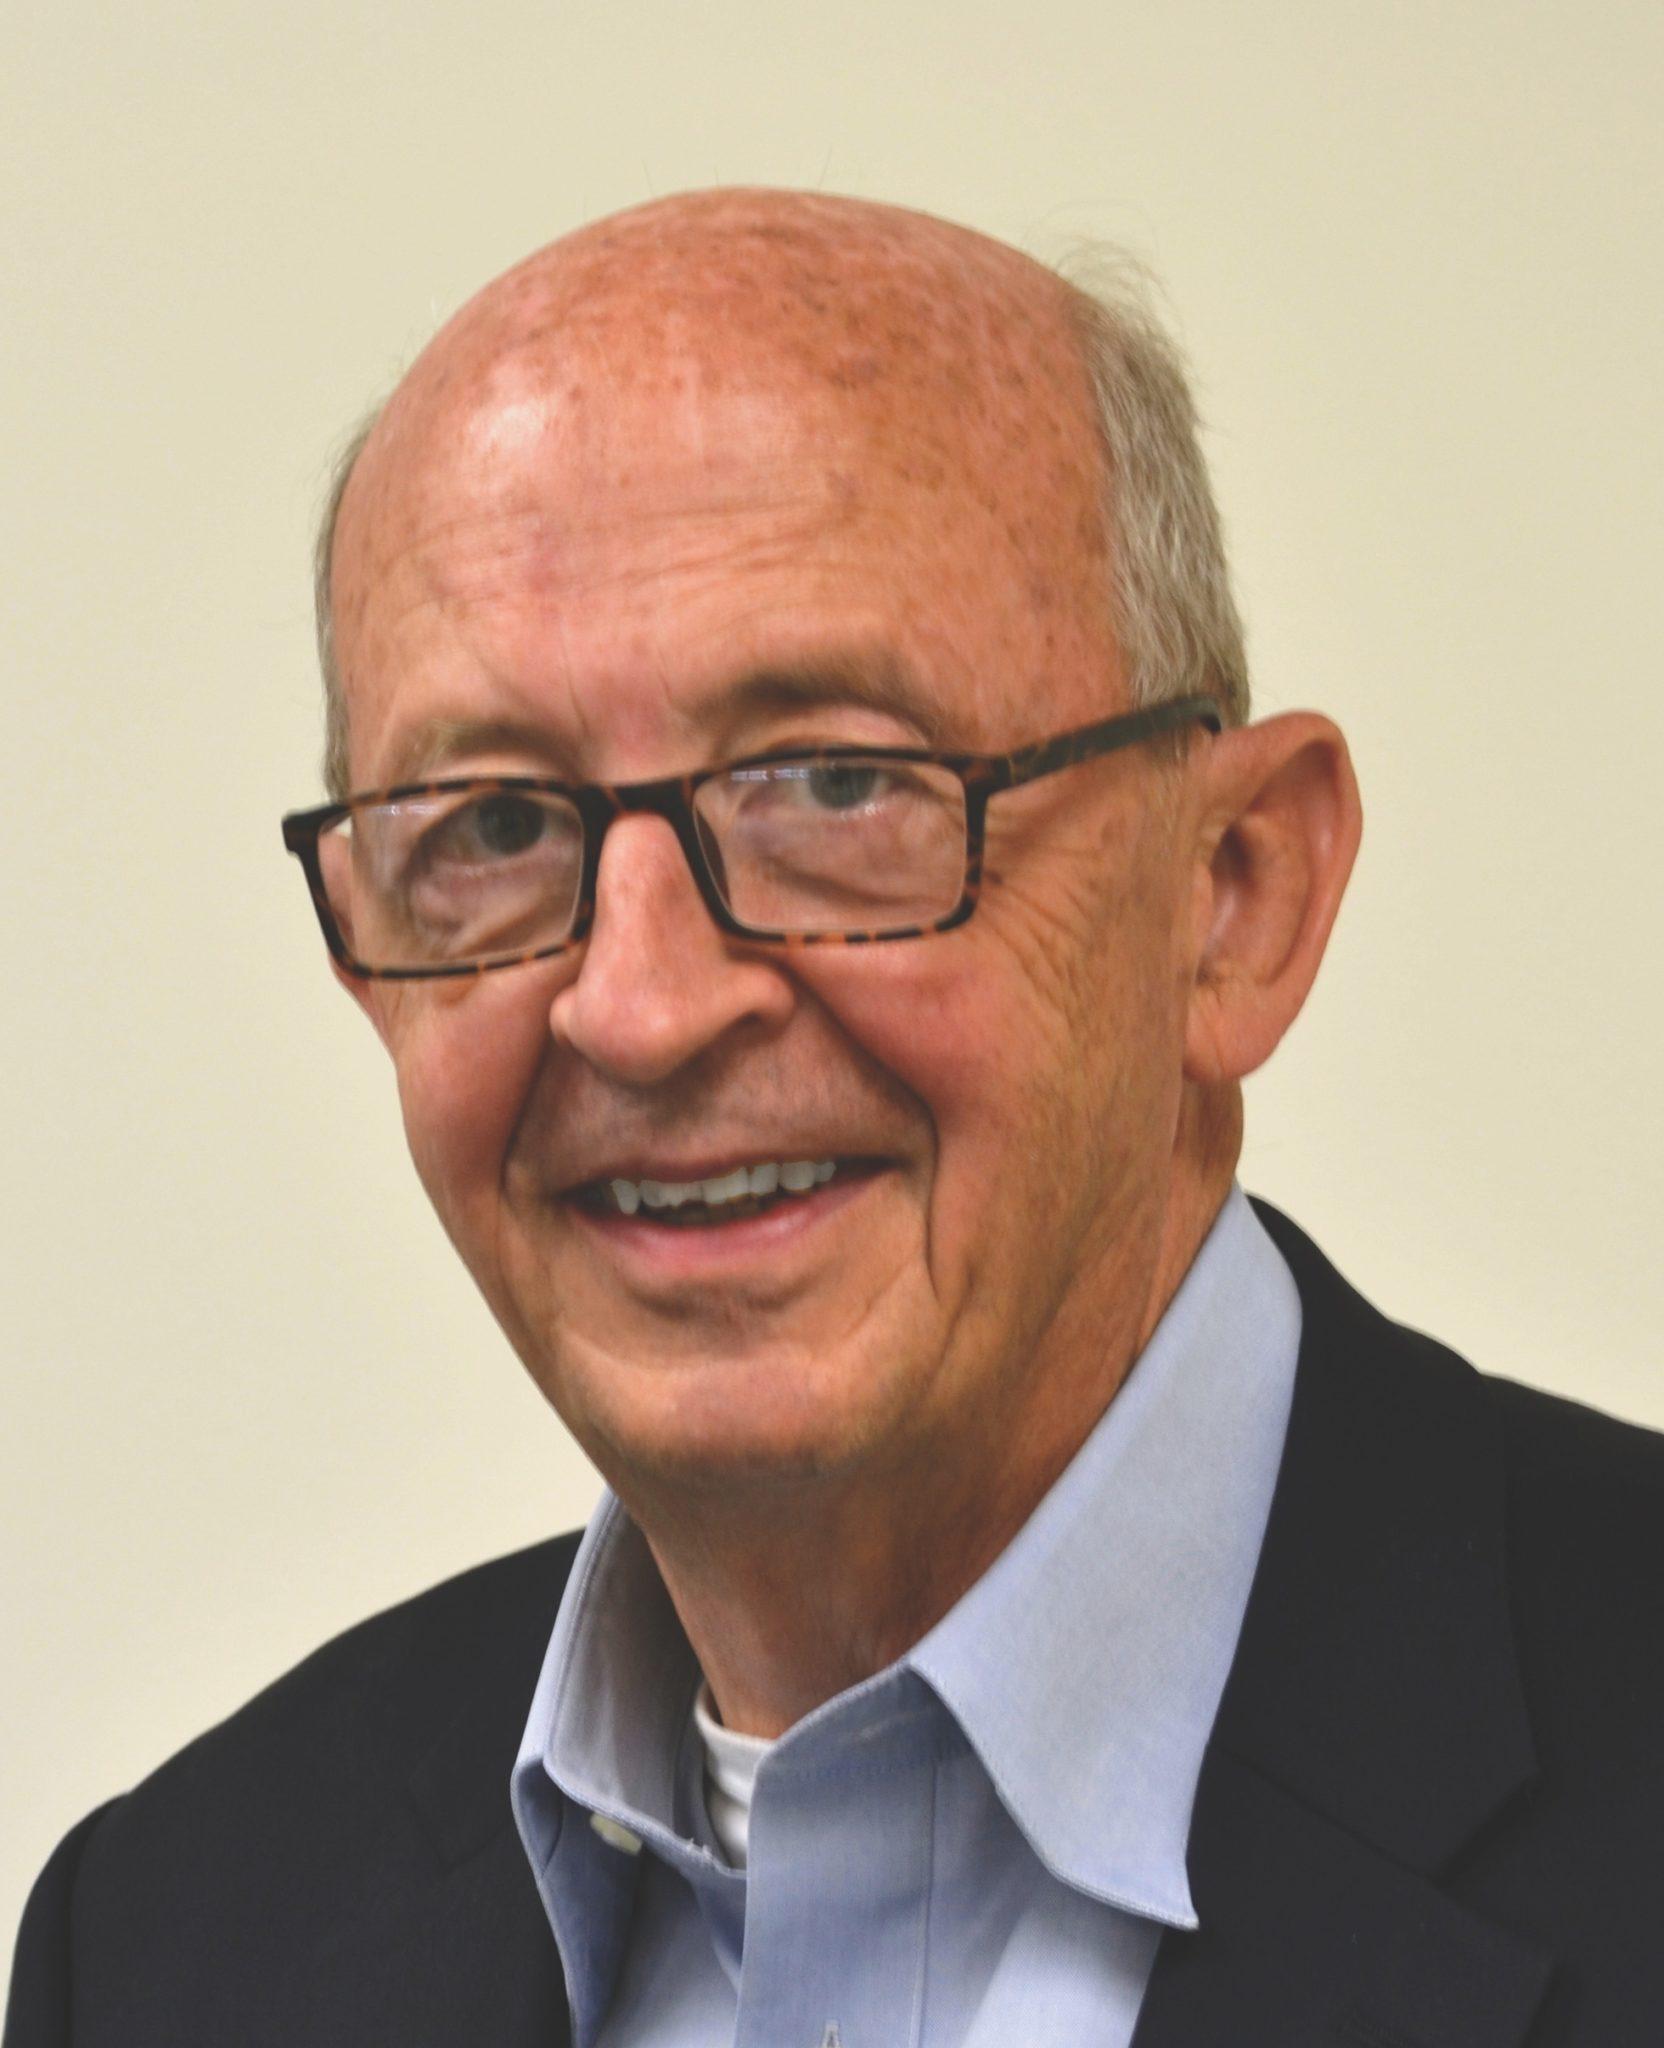 Paul Baldwin Principal, Baldwin Health Policy Group